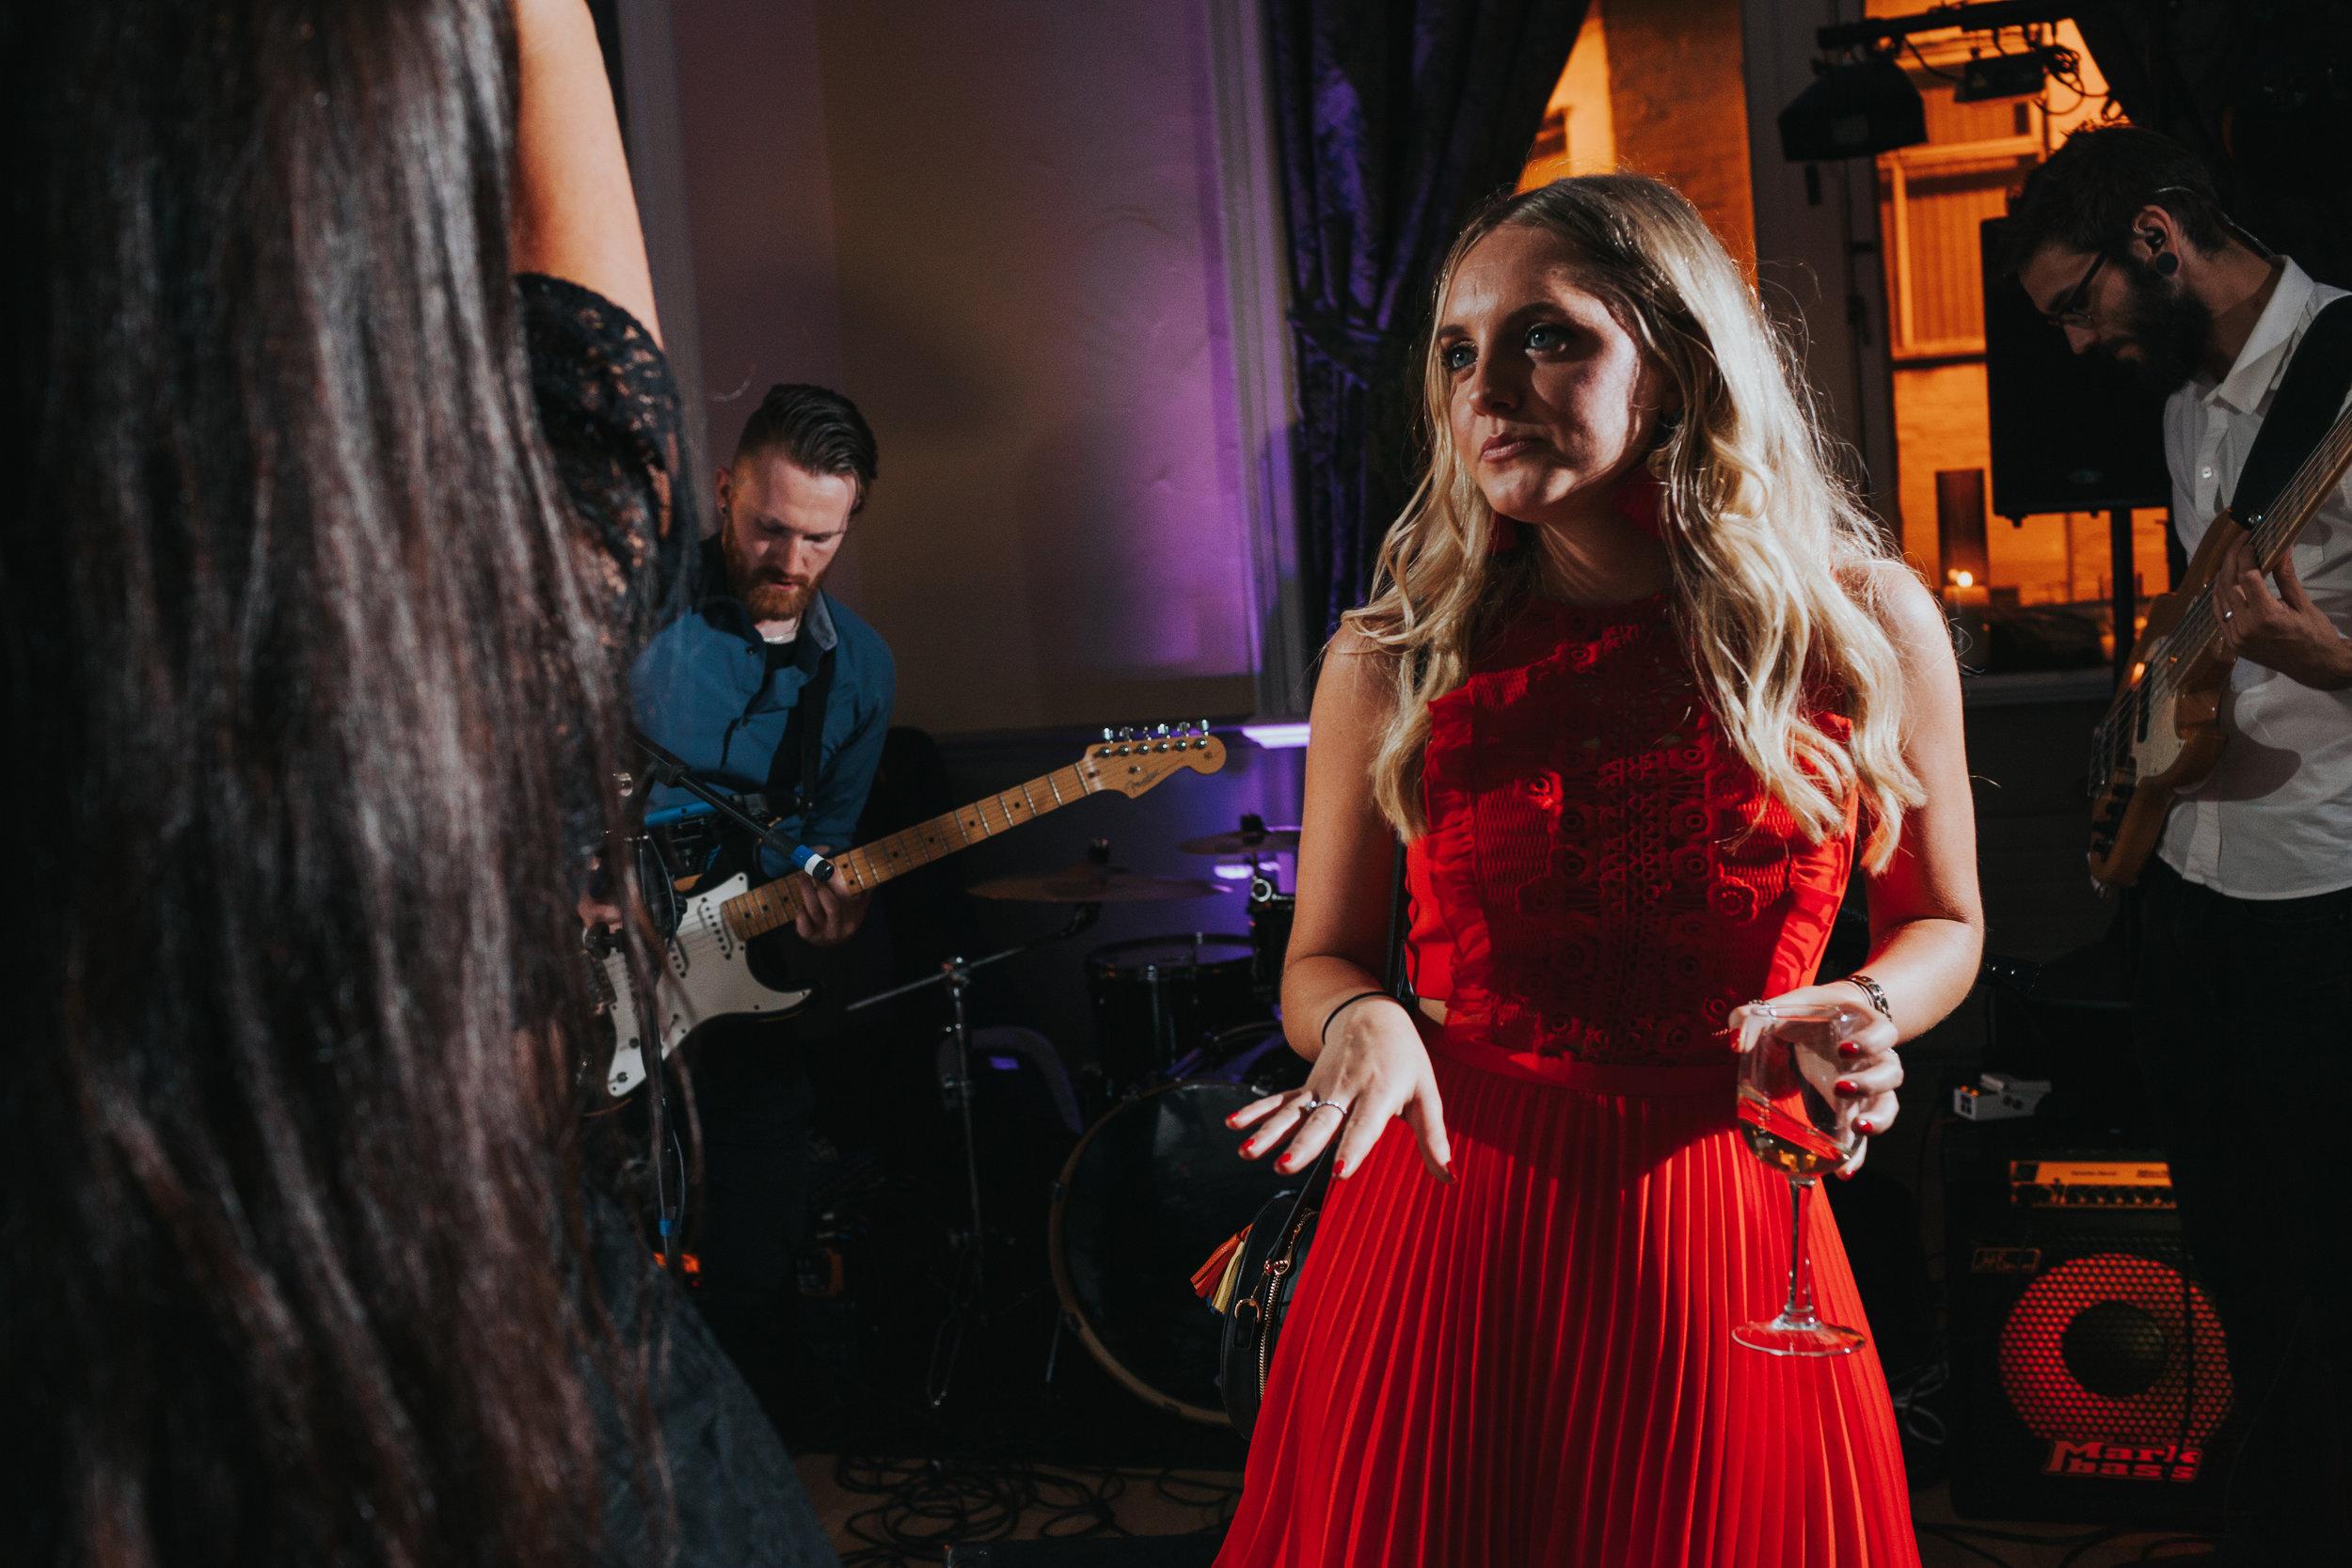 Wedding guest wearing red dress dancing.